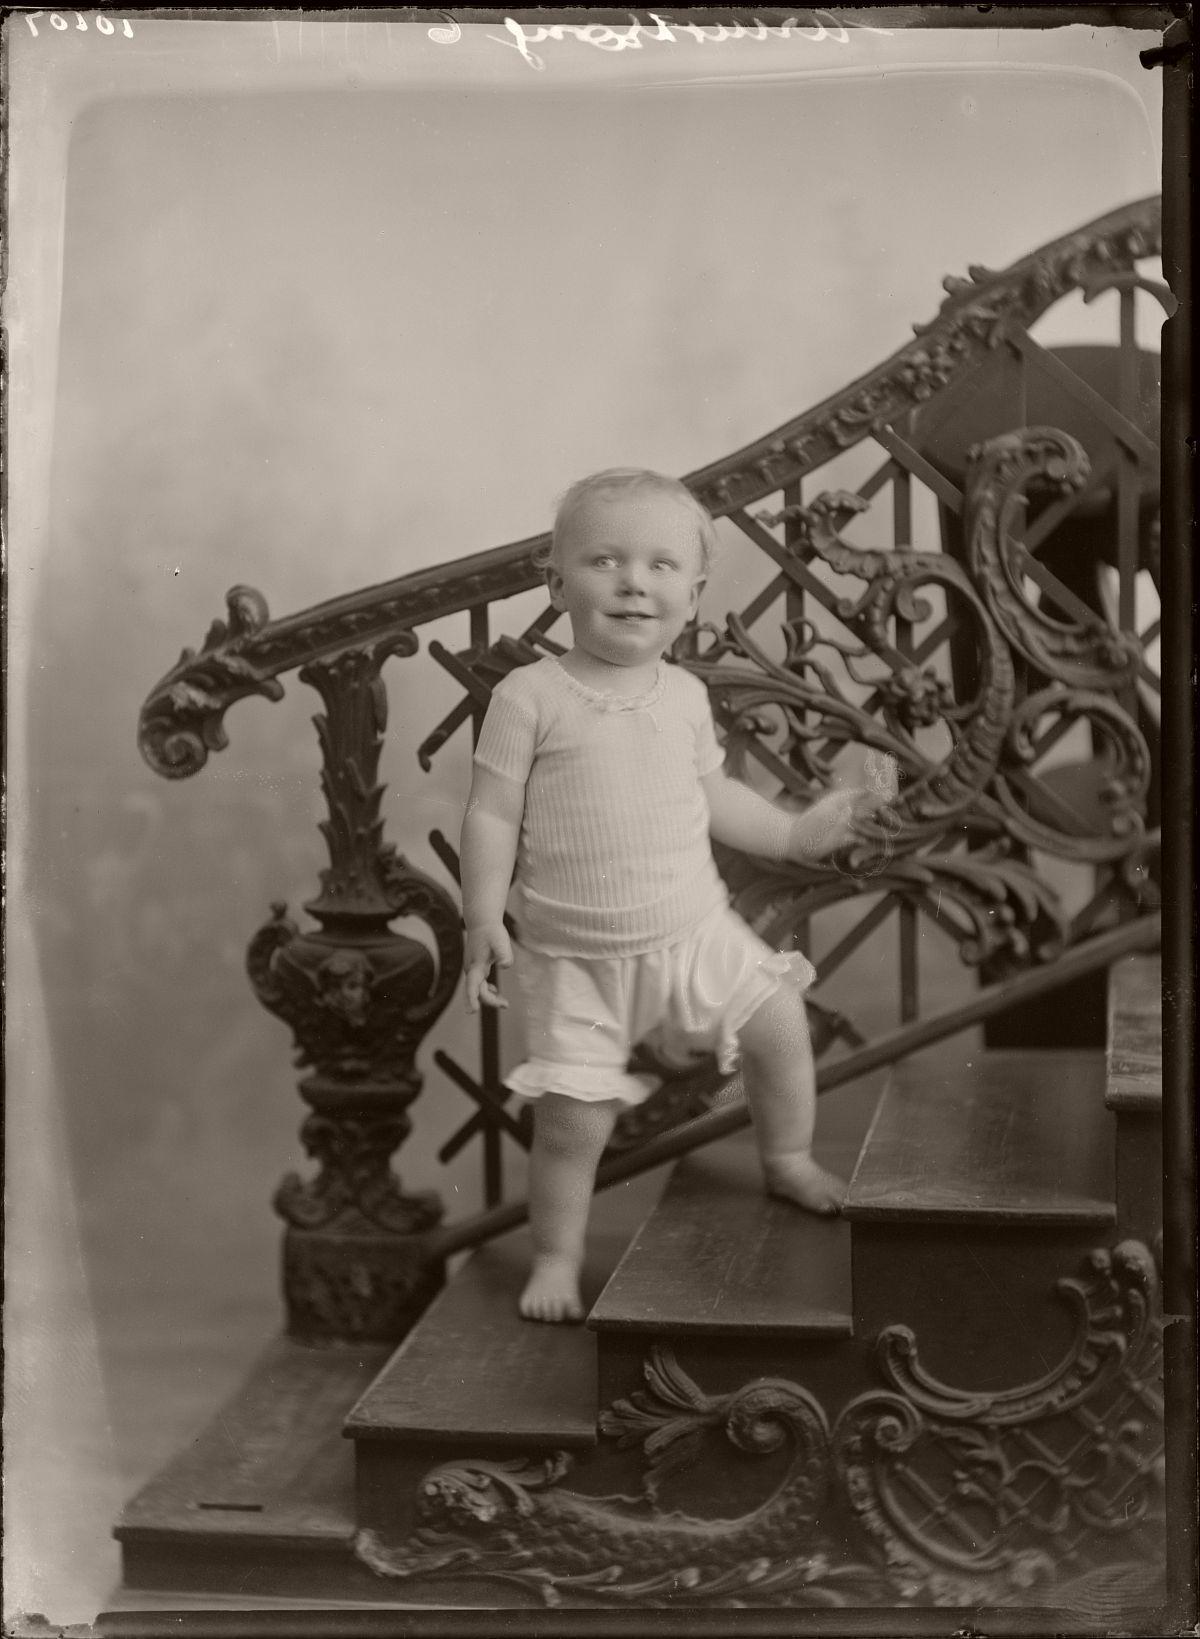 Photo by William Berry, circa 1915-1920, Wellington